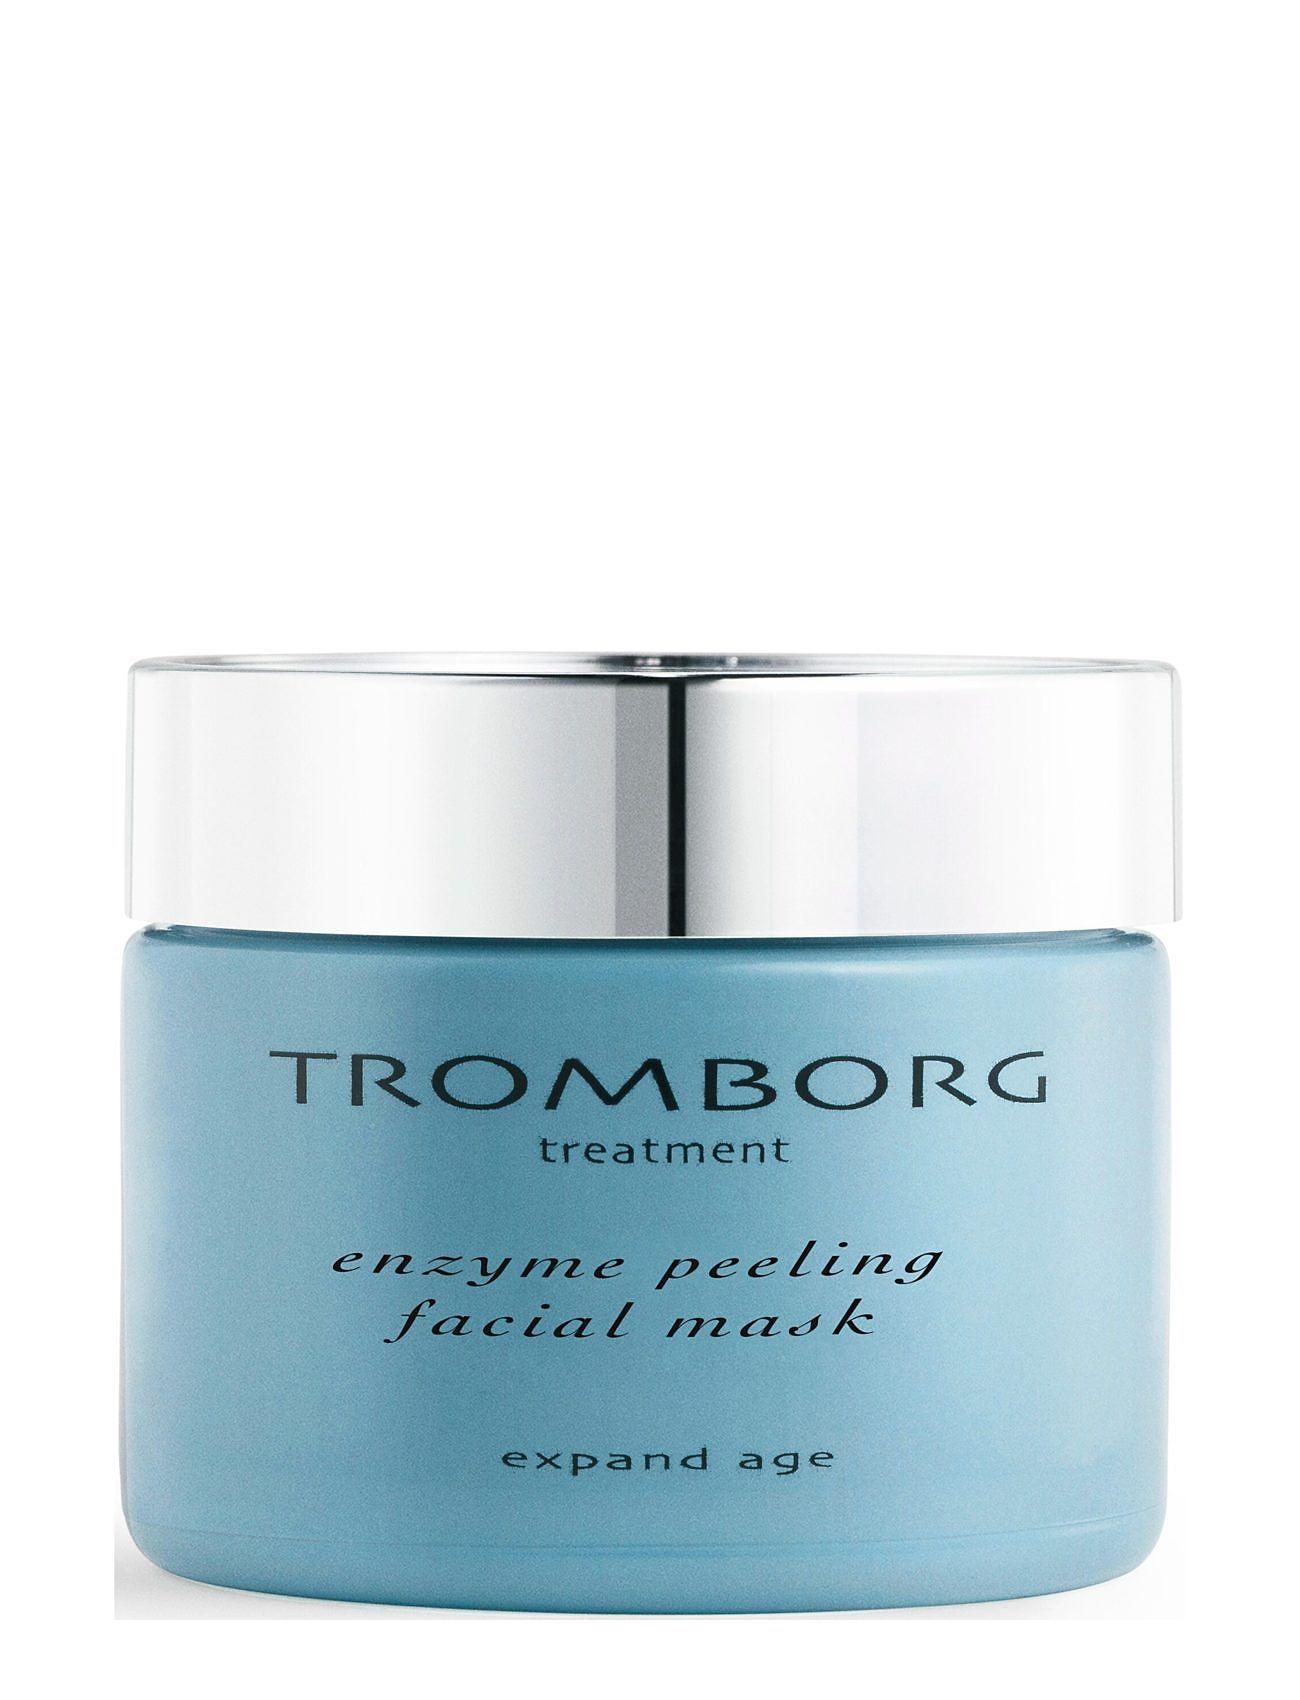 Image of Enzyme Peeling Facial Mask Beauty WOMEN Skin Care Face Face Masks Nude Tromborg (3271519131)